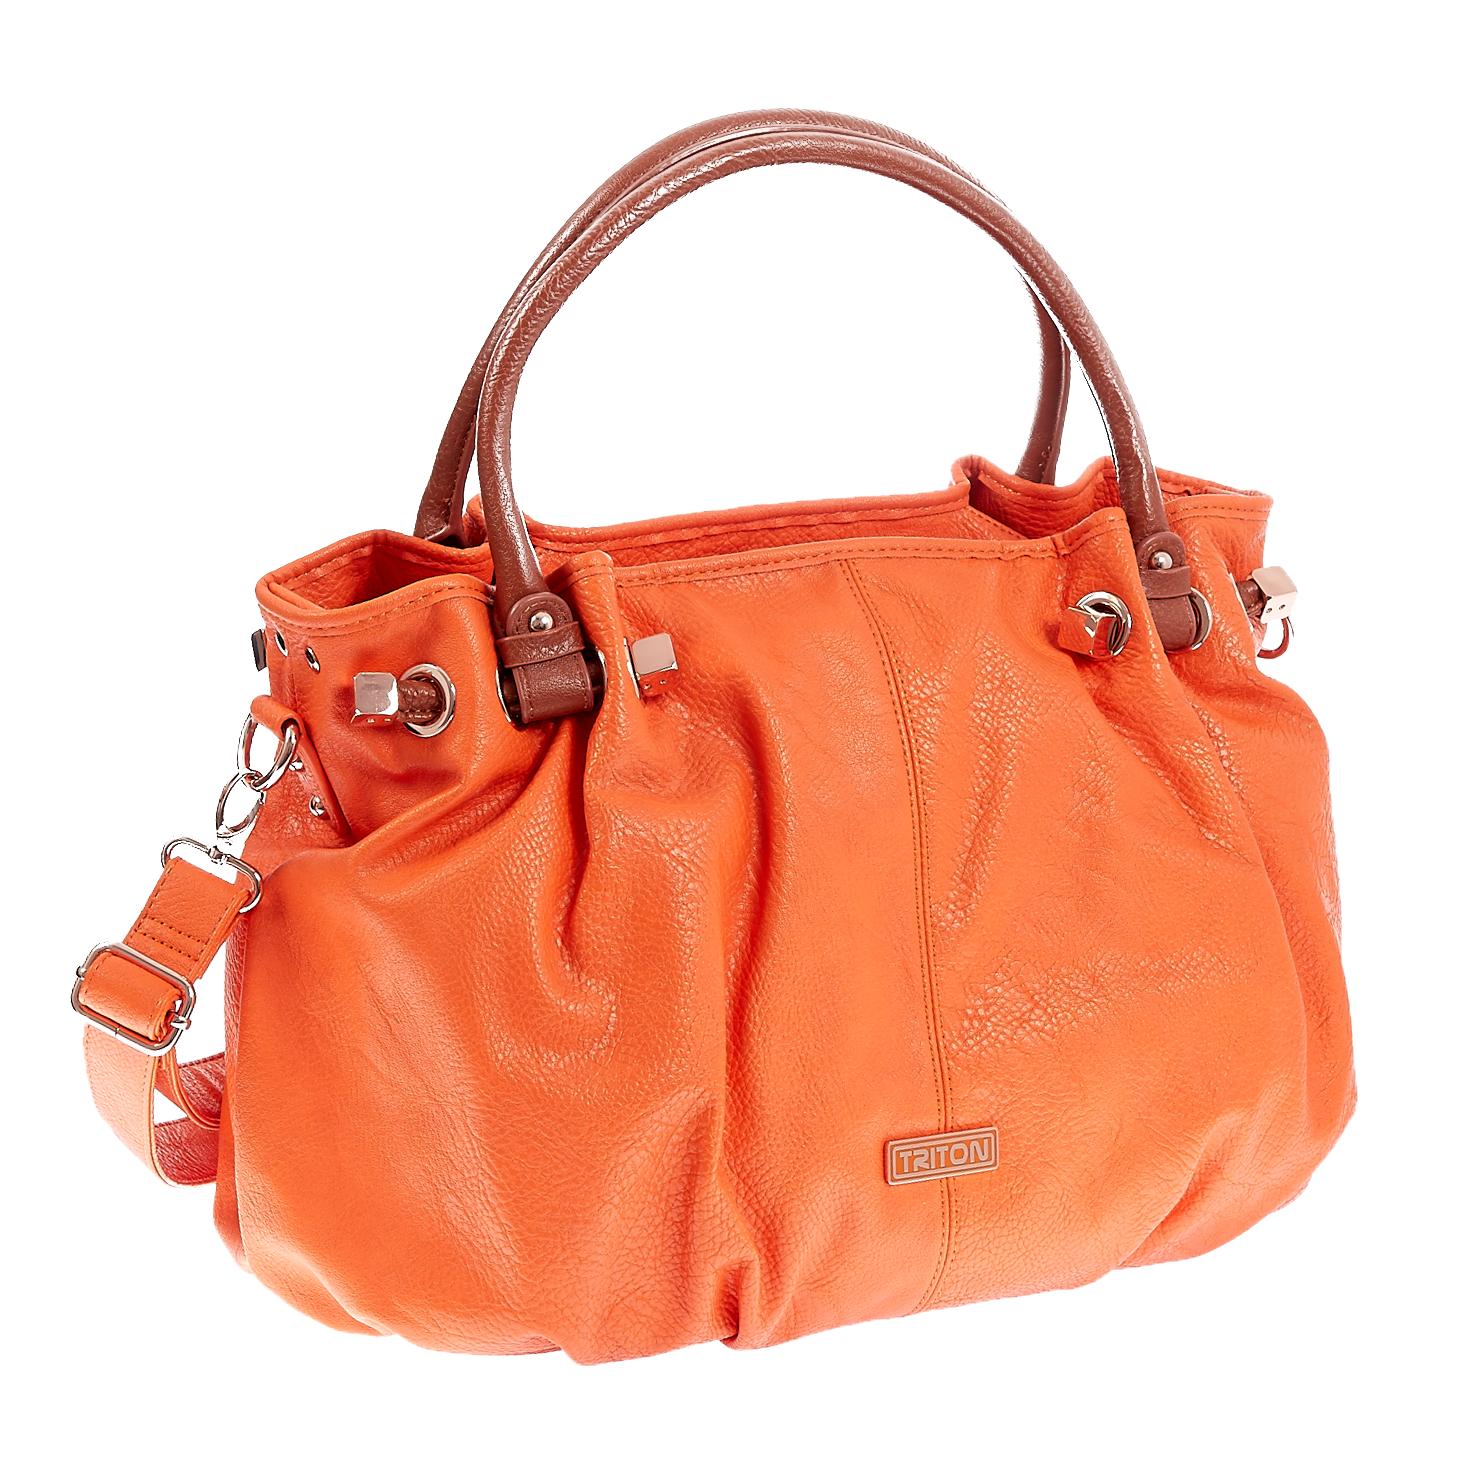 TRITON – Γυναικεία τσάντα Triton πορτοκαλί